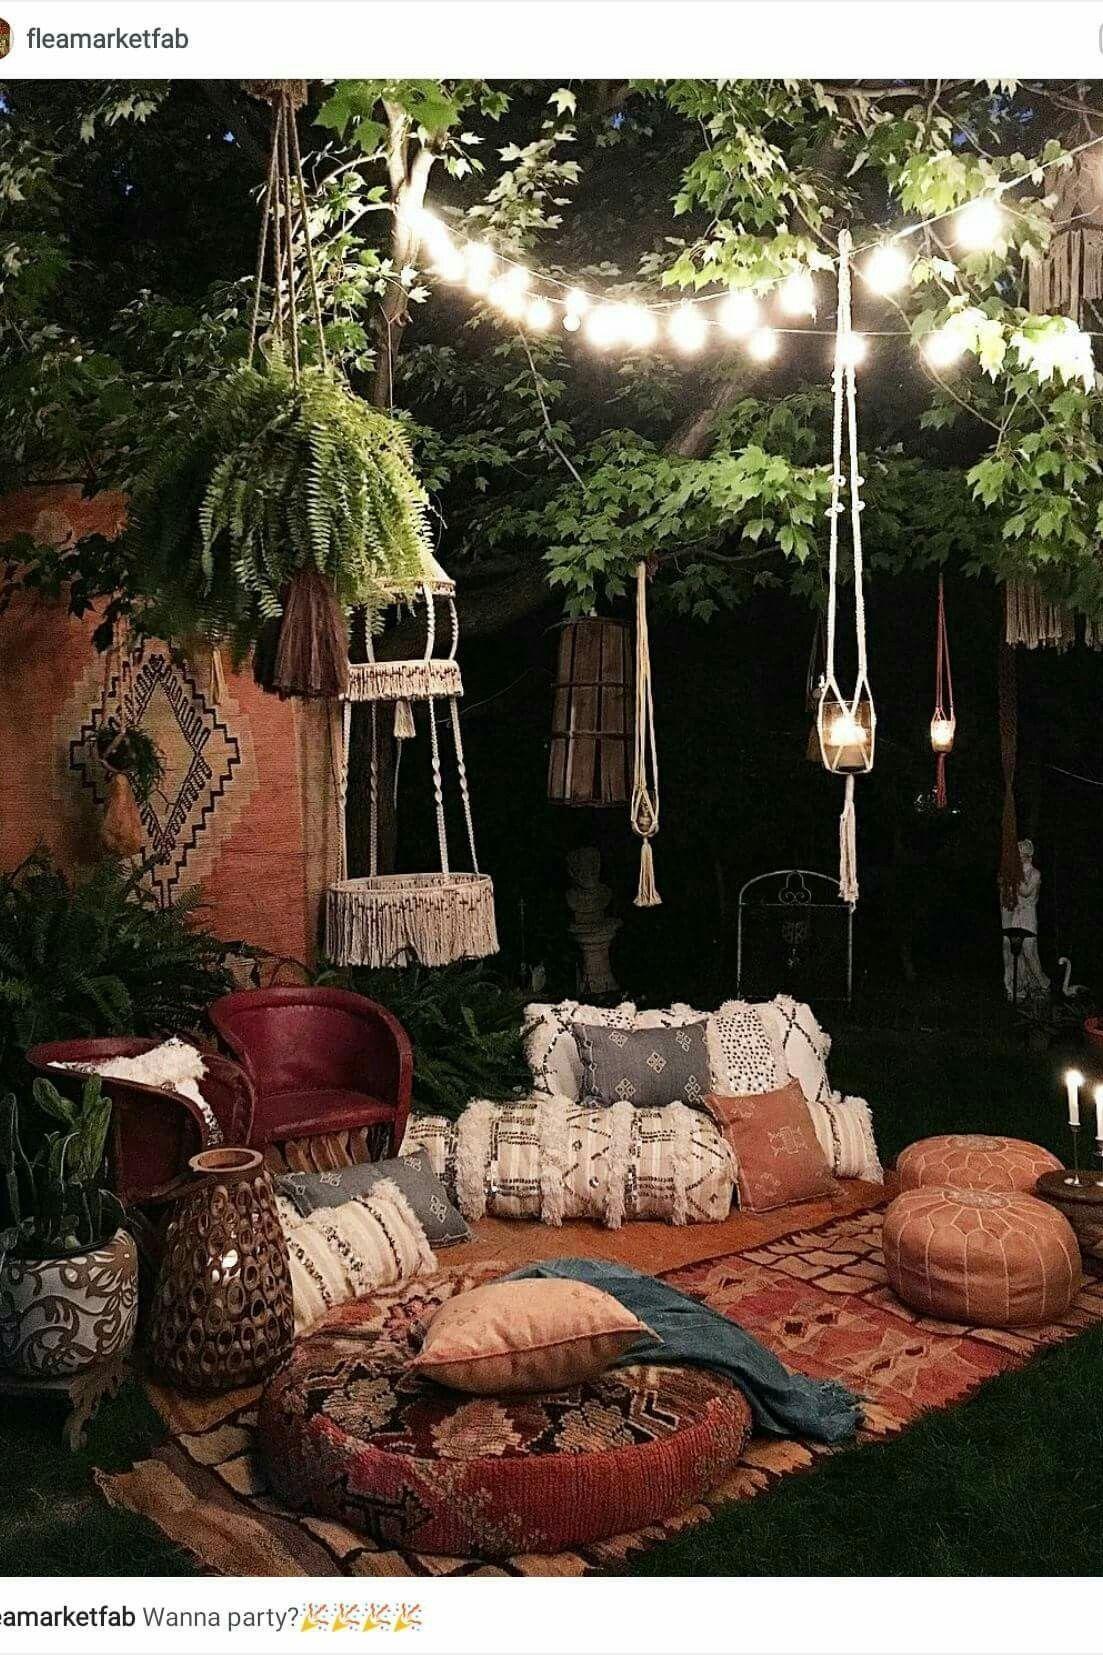 Take Home Lessons On Bohemian Home Decor